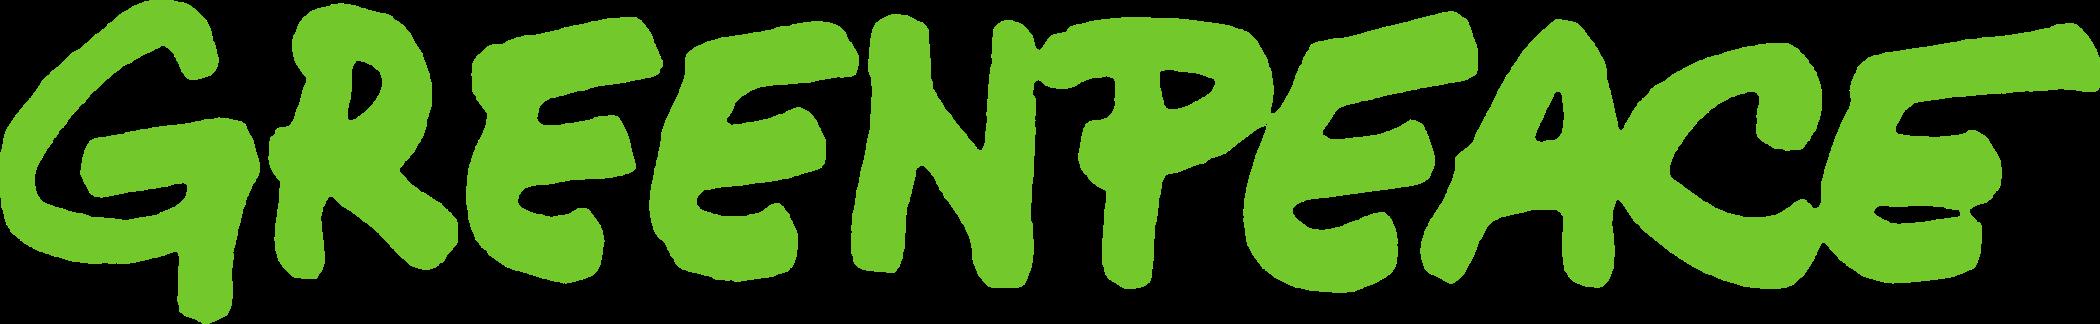 greenpeace logo 2 - Greenpeace Logo